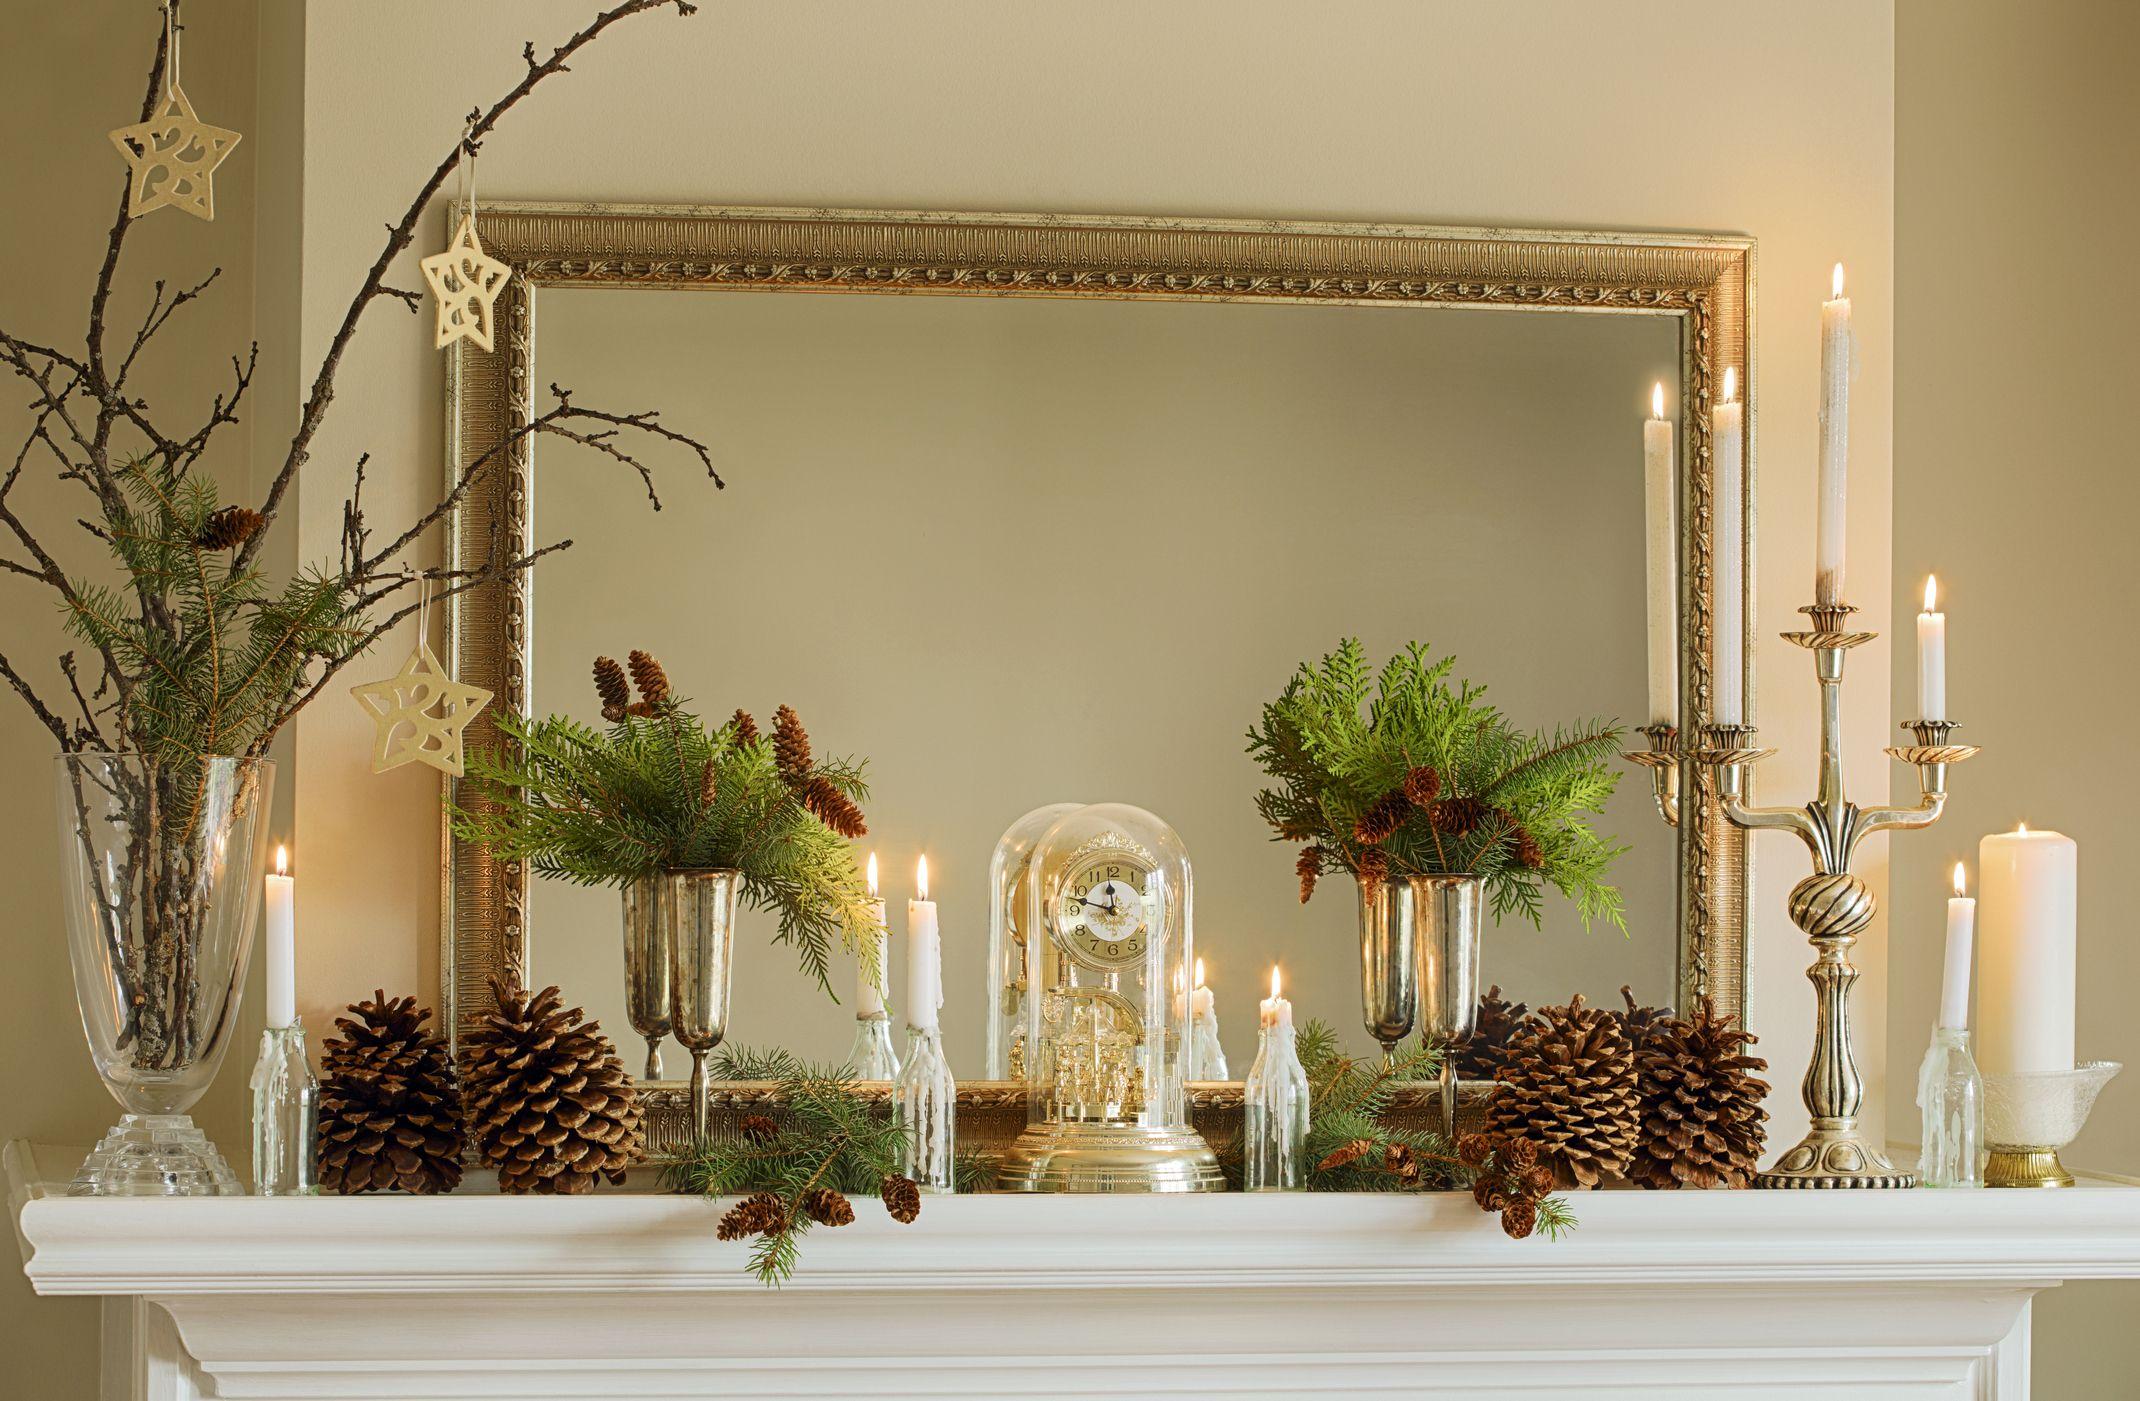 15 christmas mantel decor ideas fireplace holiday decorations15 christmas mantel decorations for a merry celebration